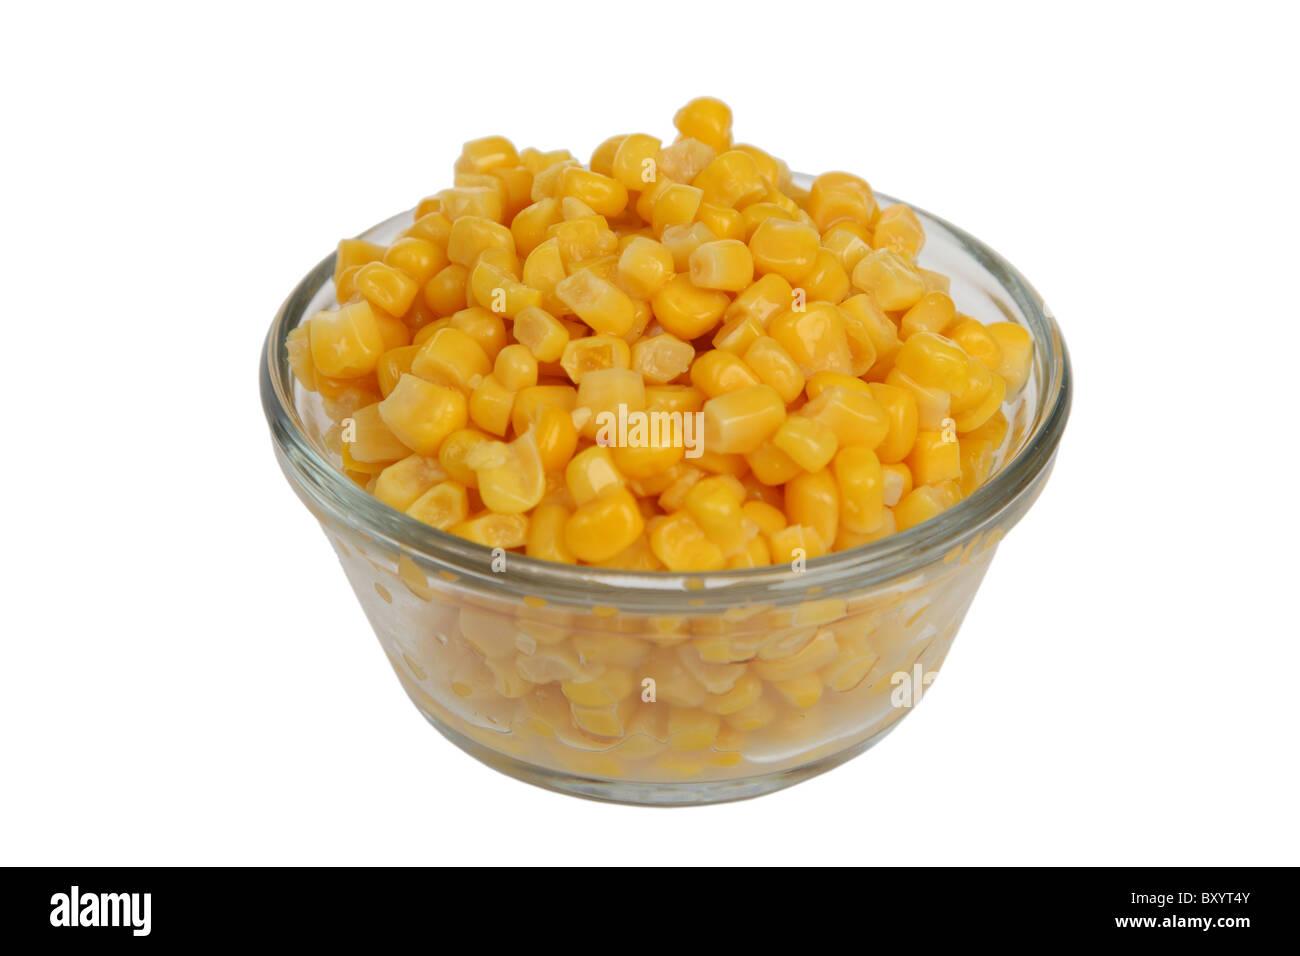 Bol de maïs sur fond blanc Photo Stock